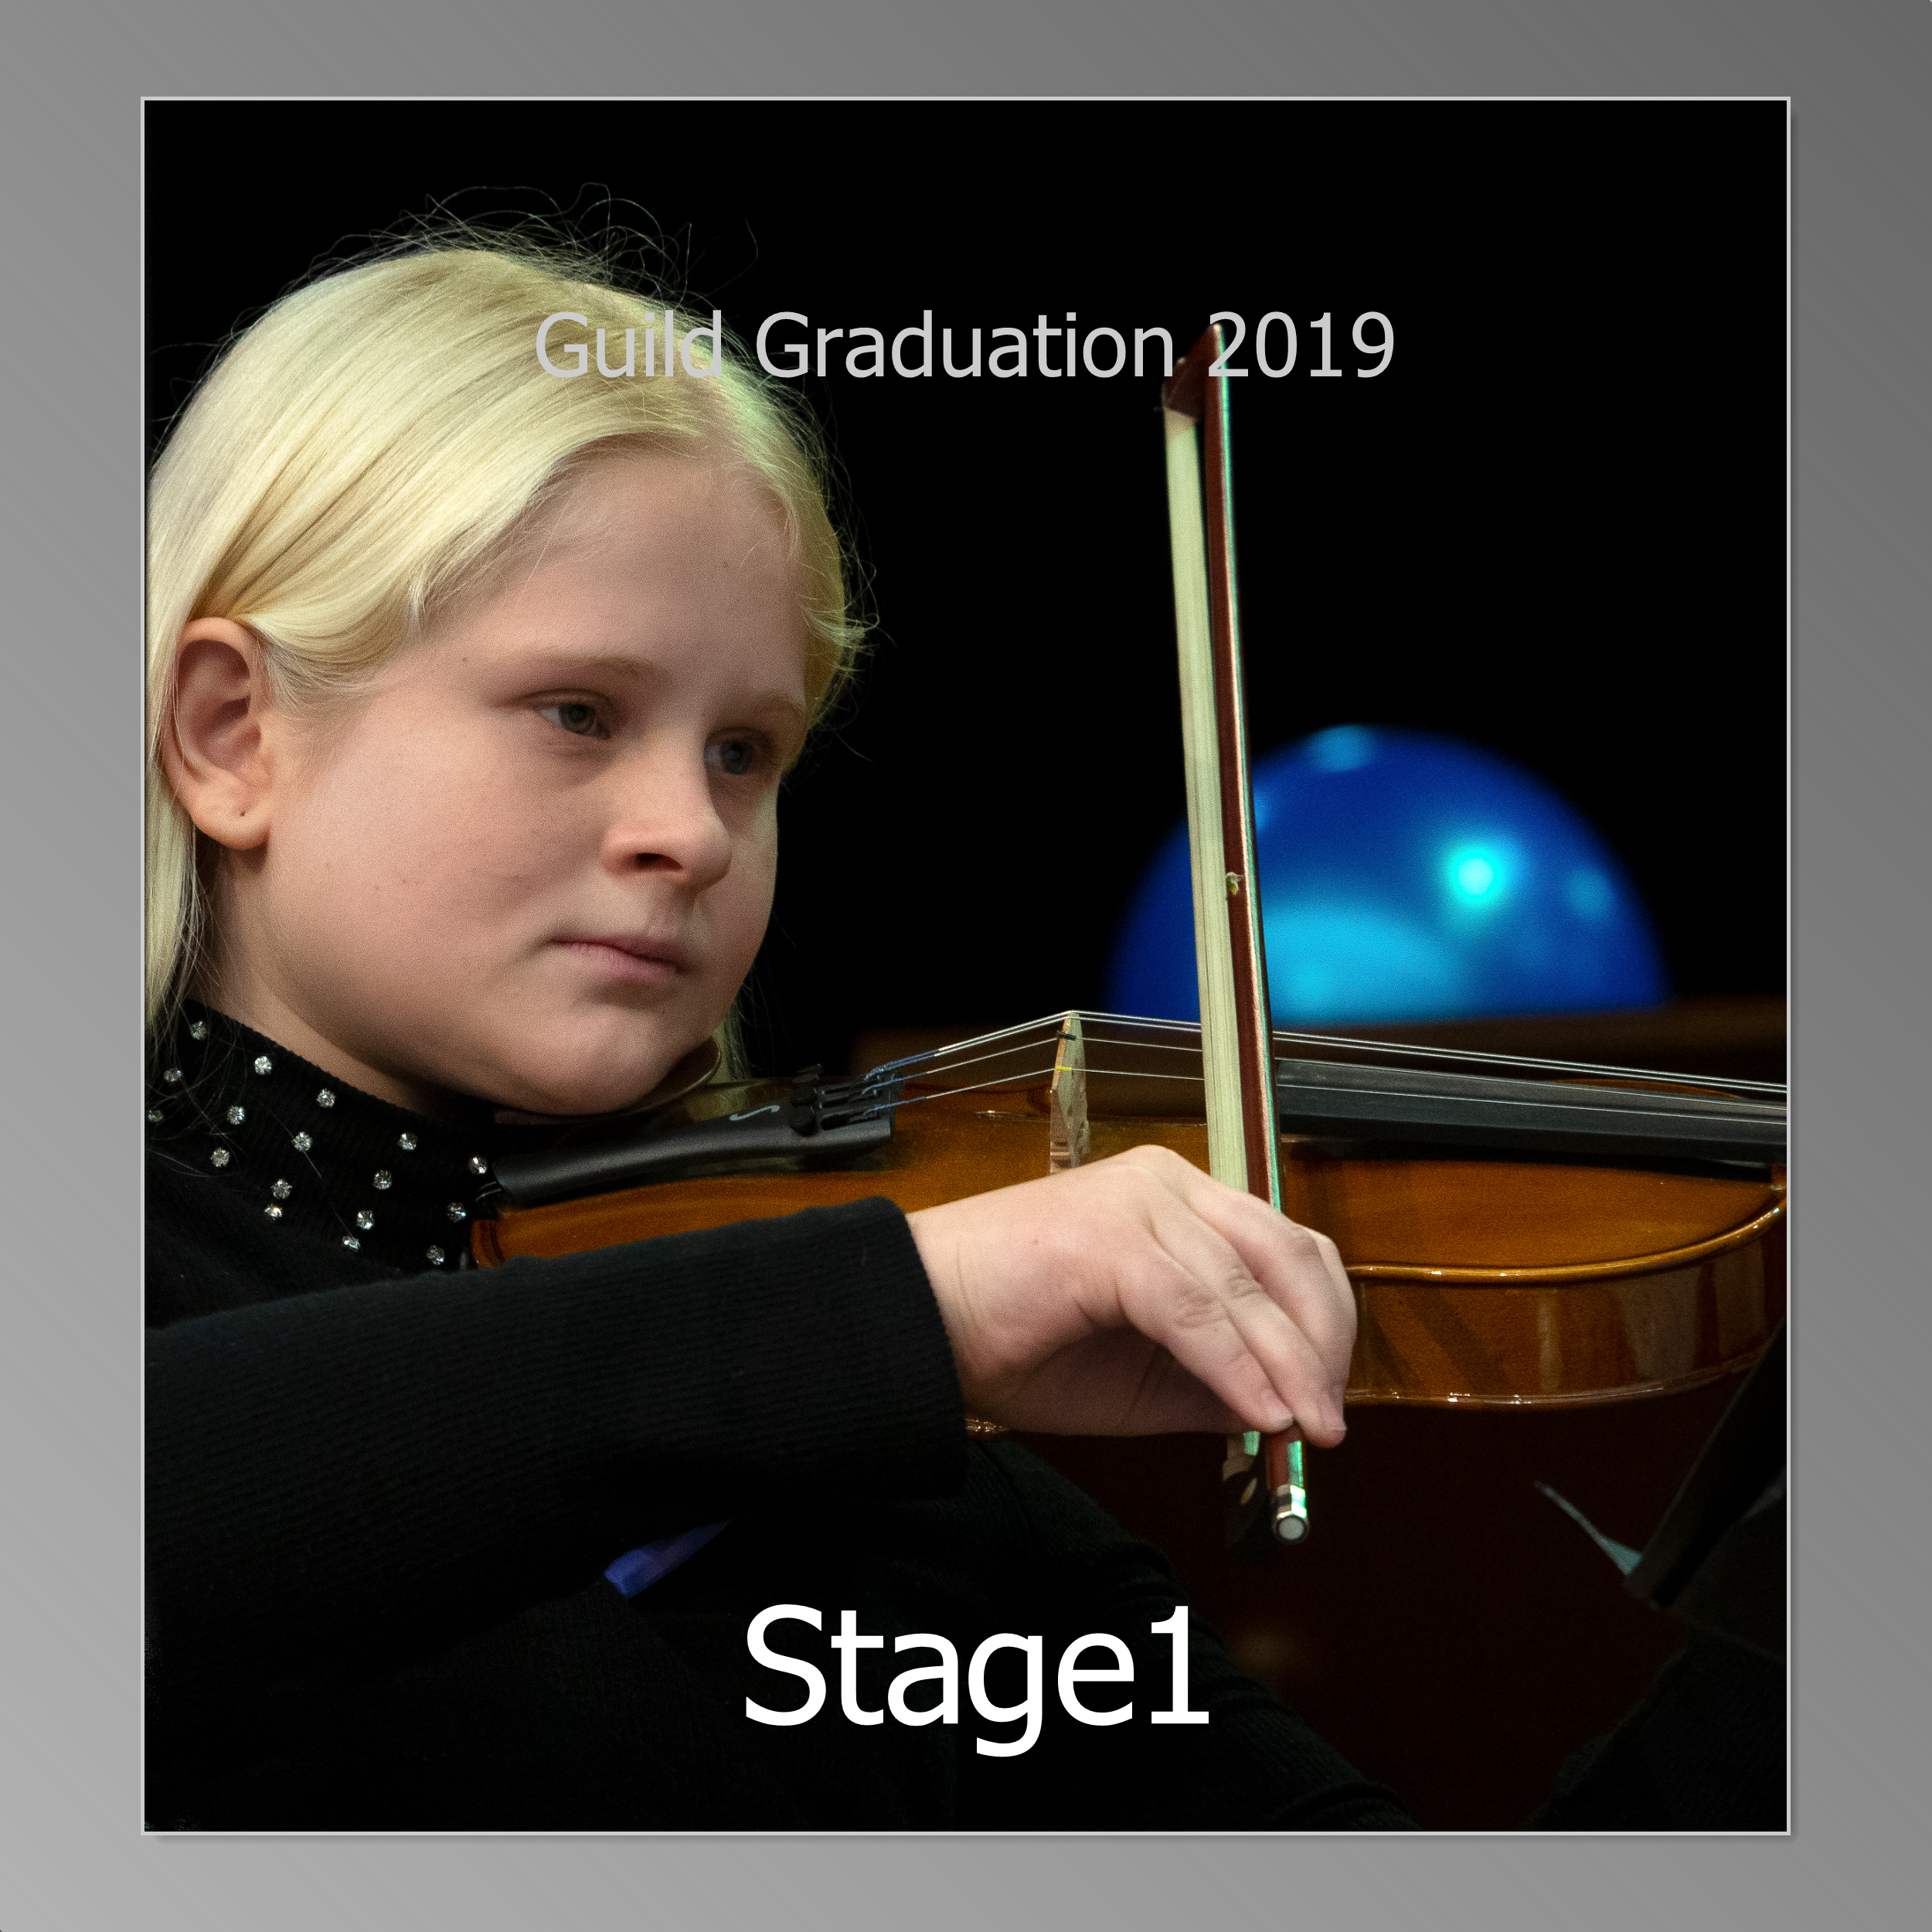 Stage JPGs-01.jpg